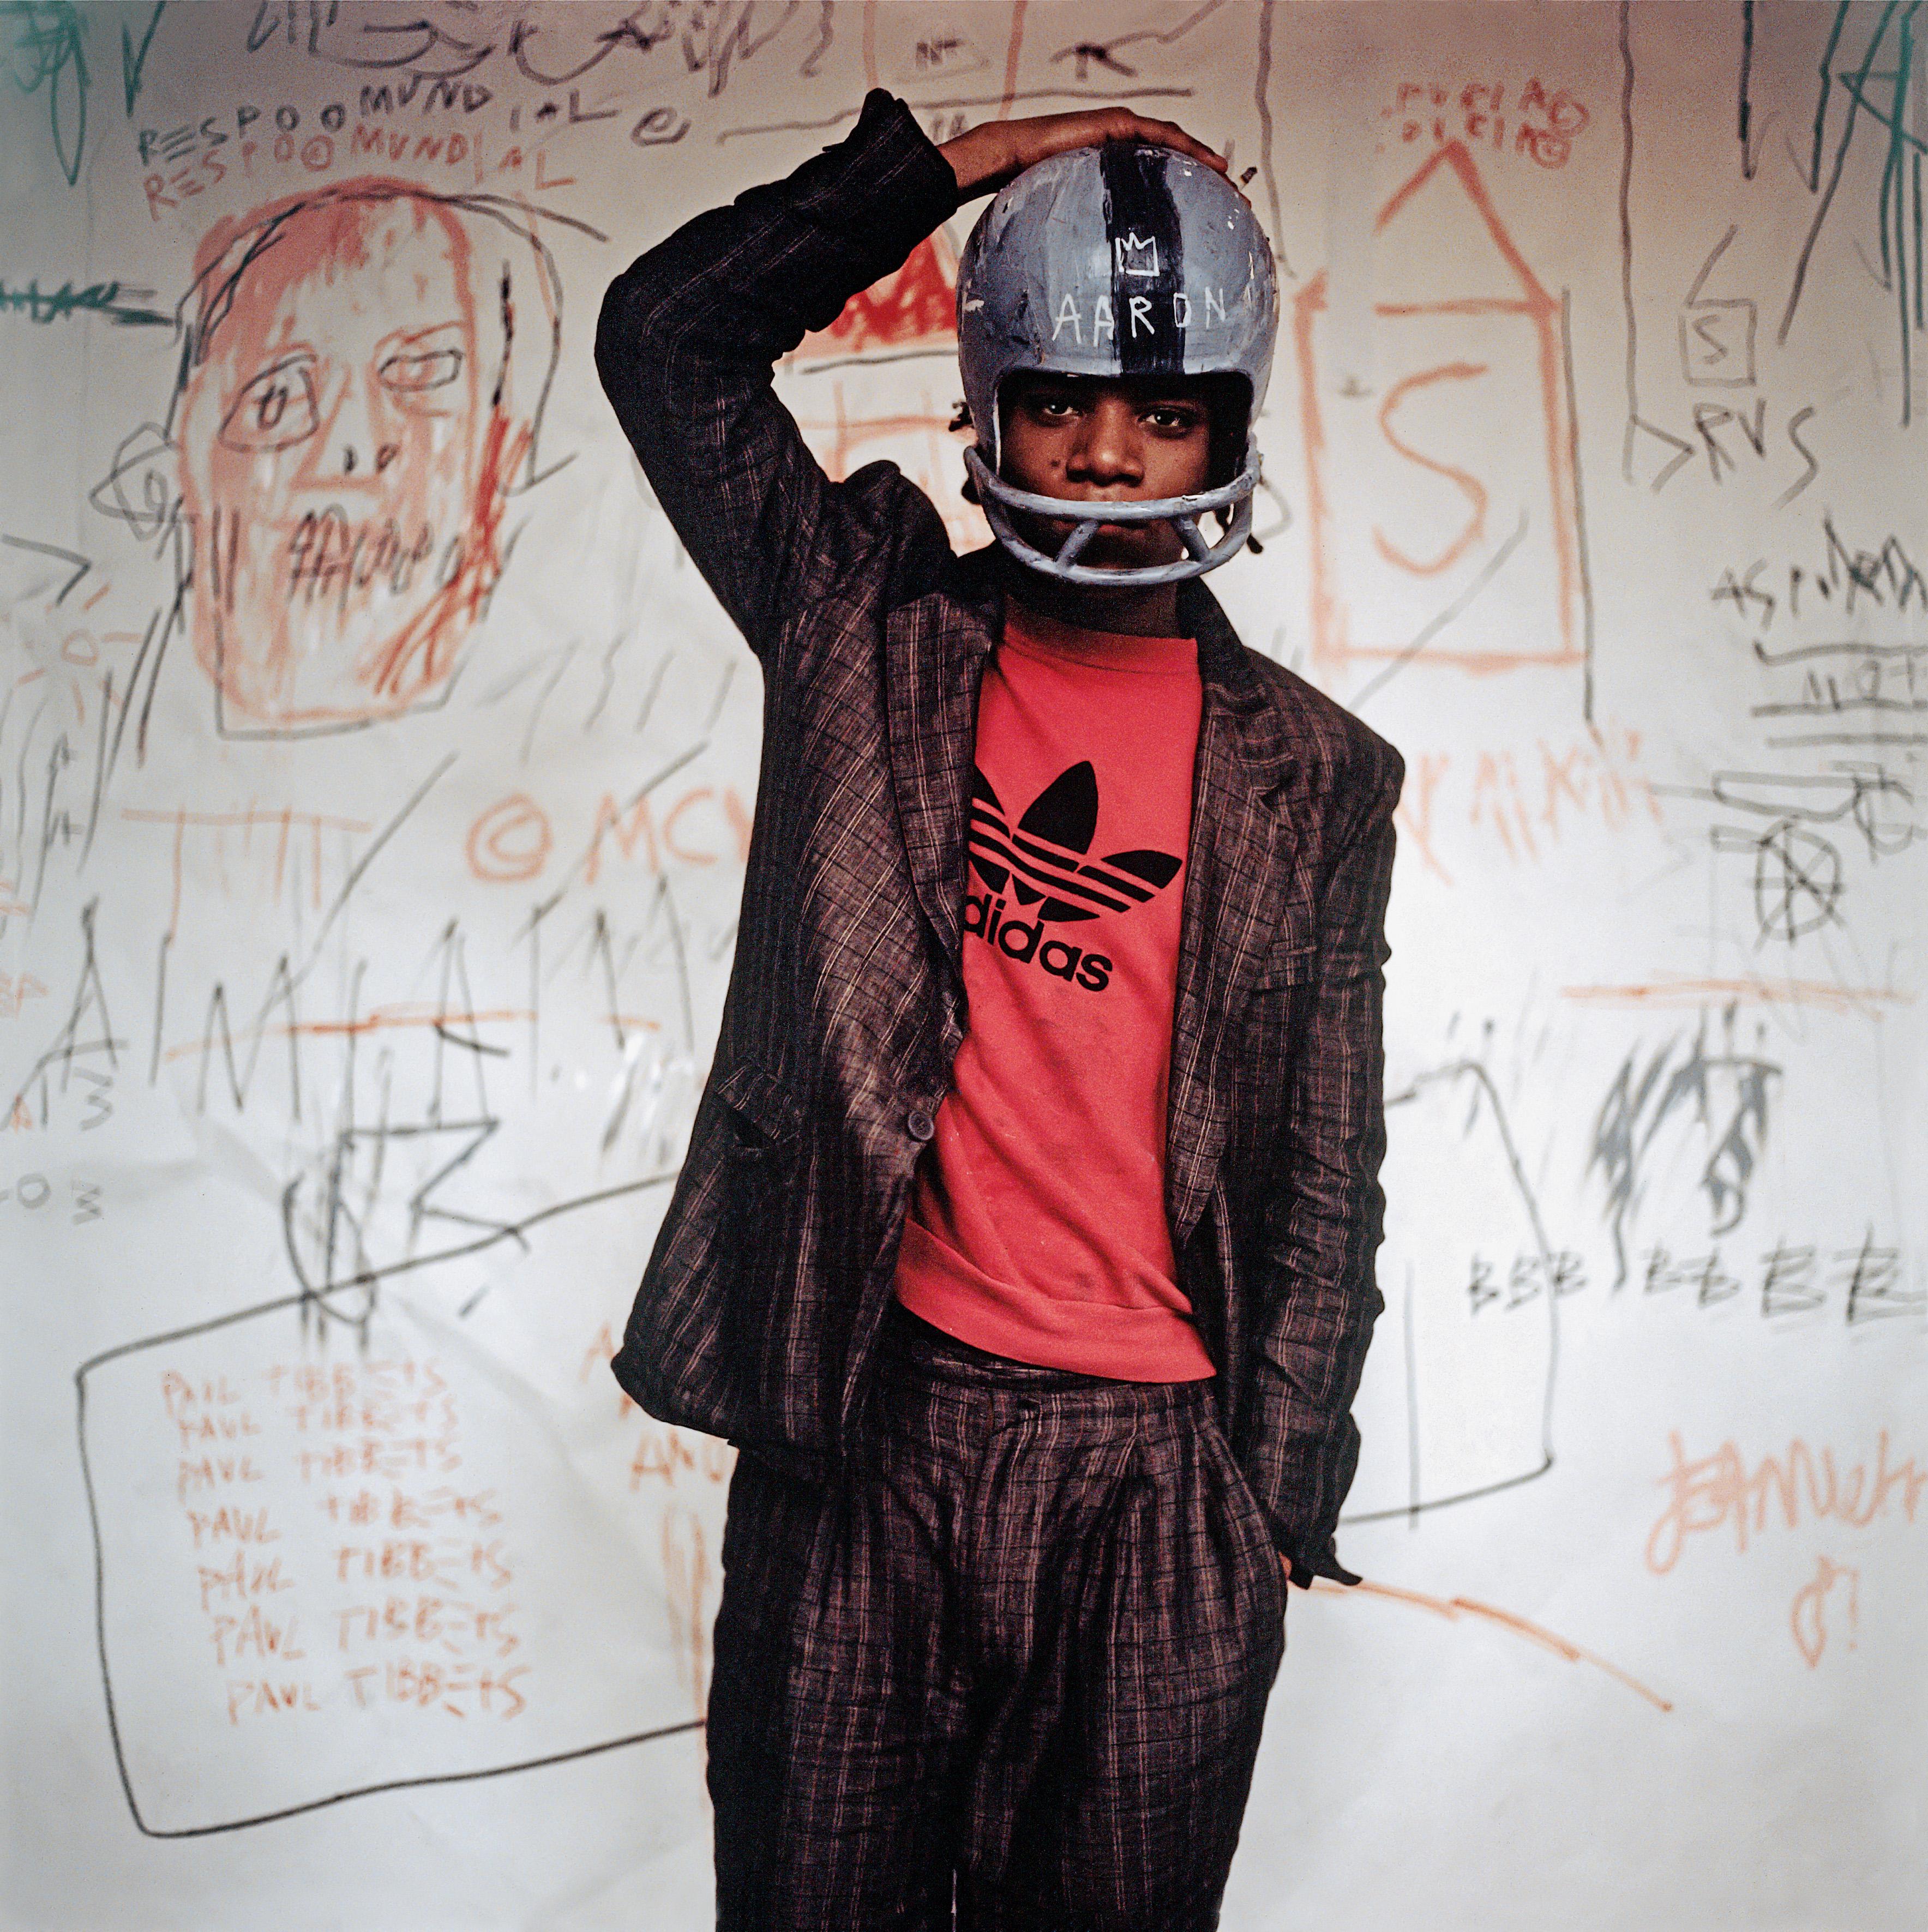 Edo Bertoglio, Jean-Michel Basquiat wearing an American football helmet, 1981, Photo: © Edo Bertoglio, courtesy of Maripol, Artwork: © VG Bild-Kunst Bonn, 2018 & The Estate of Jean-Michel Basquiat, Licensed by Artestar, New York